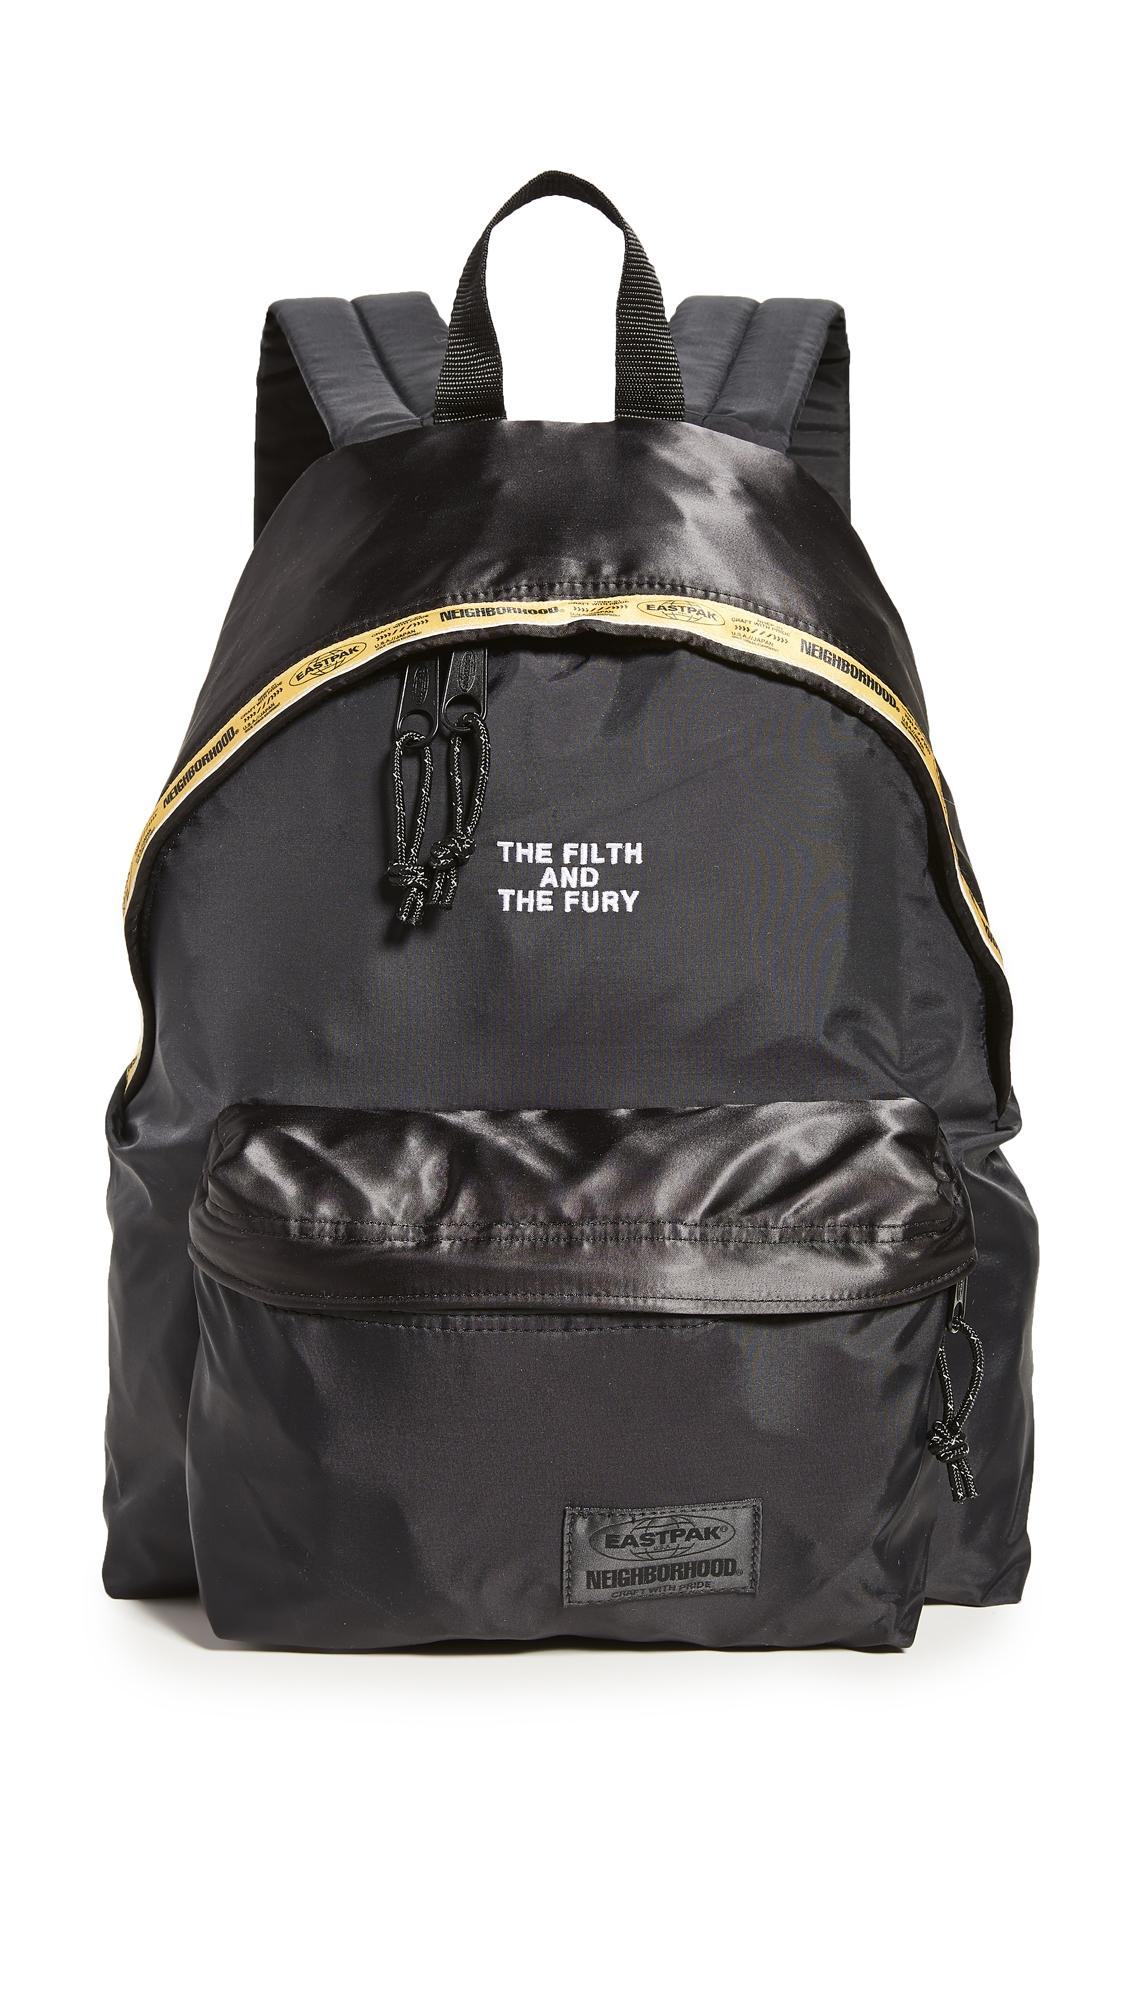 Eastpak Backpacks X NEIGHBORHOOD PADDED PAK'R BACKPACK